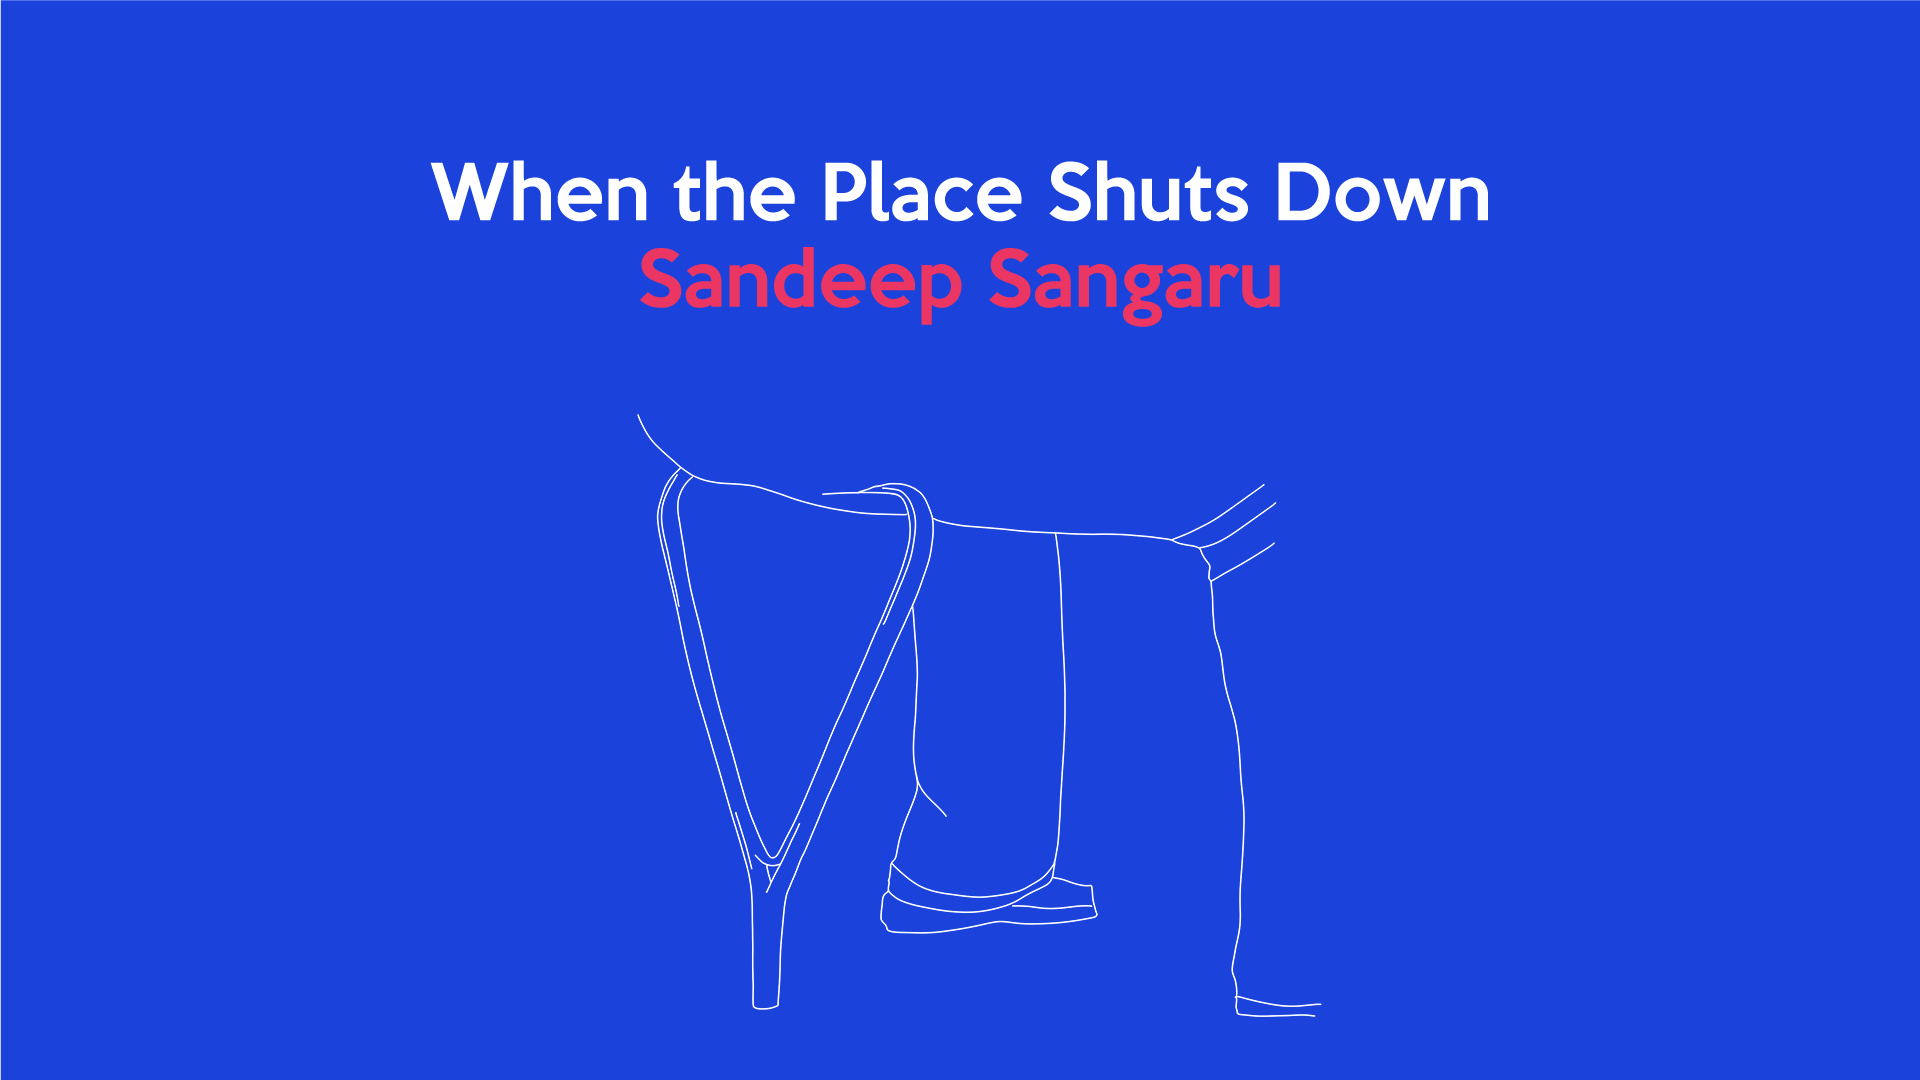 When the Place Shuts Down: Sandeep Sangaru